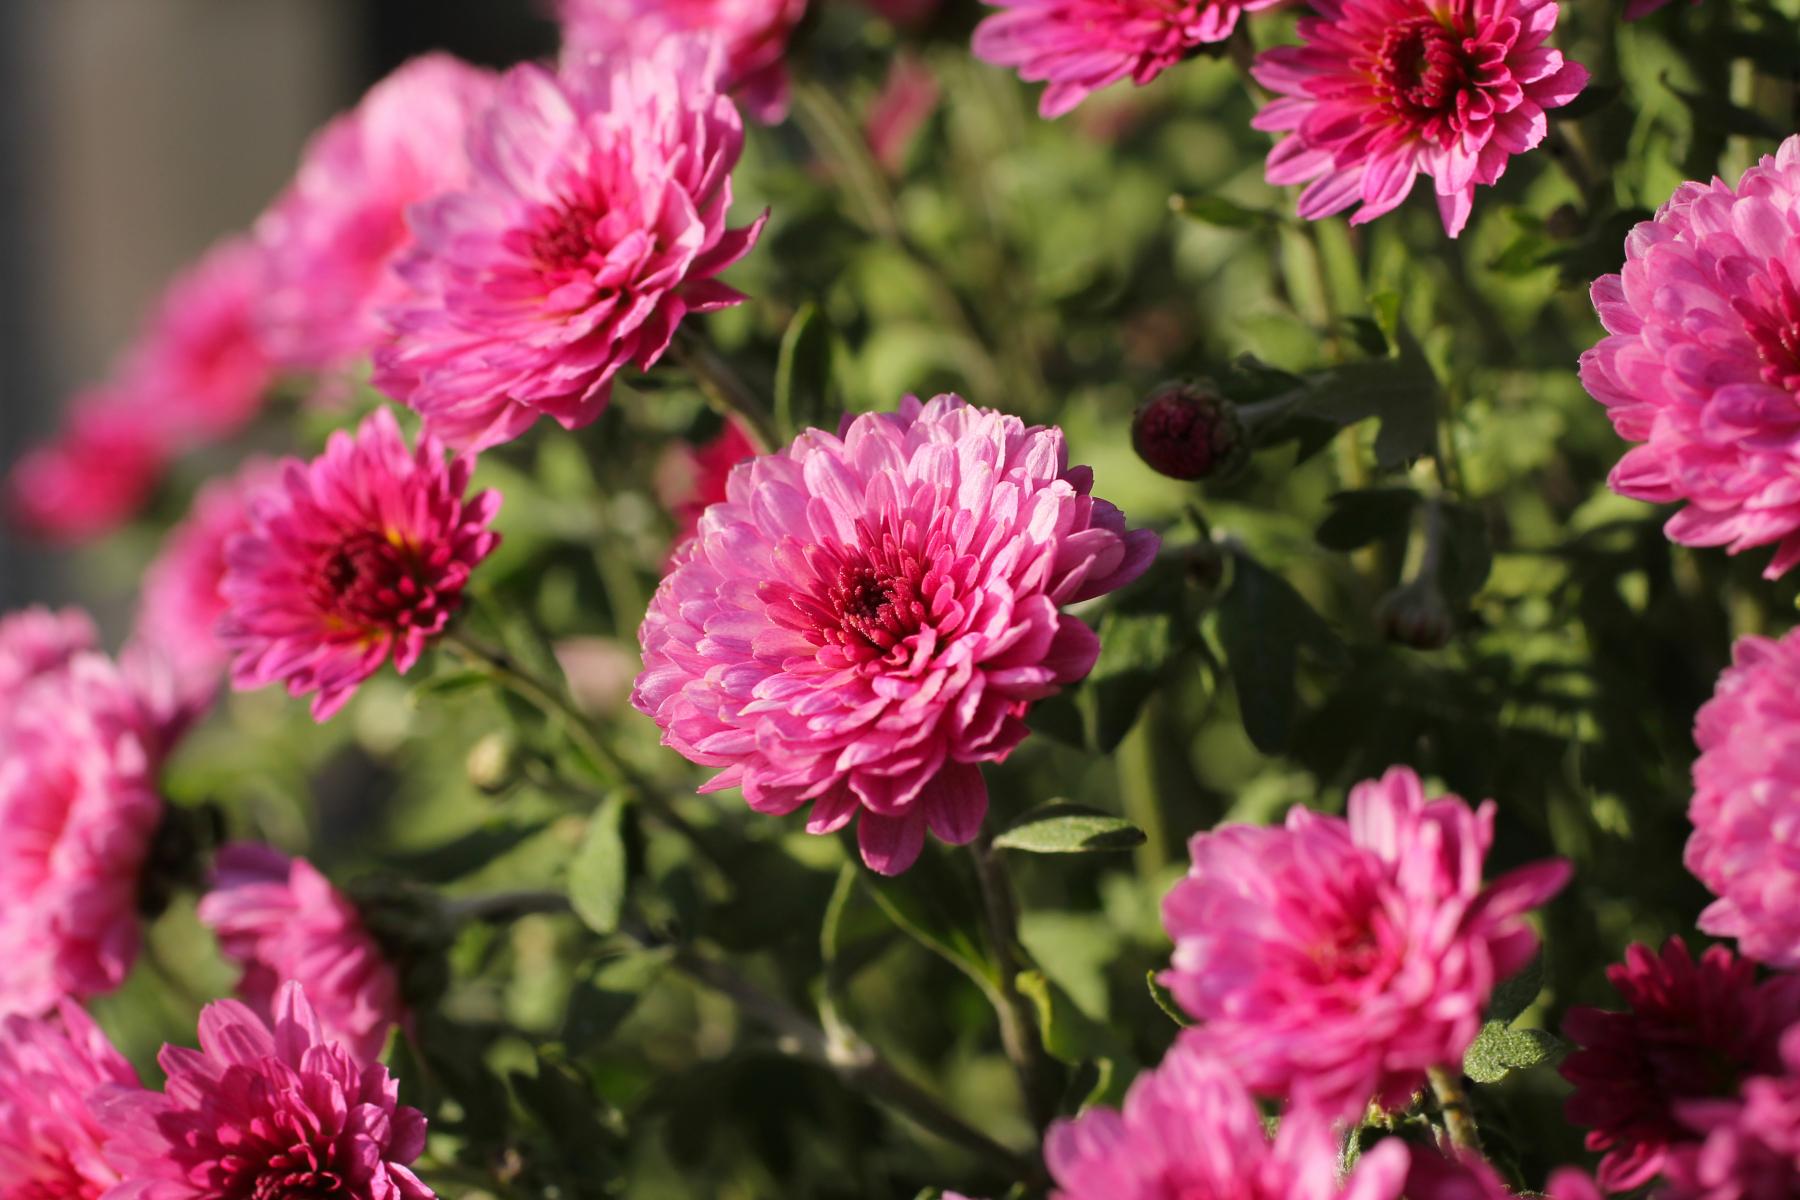 Mørk rosa krysantemum med ovale kronblader